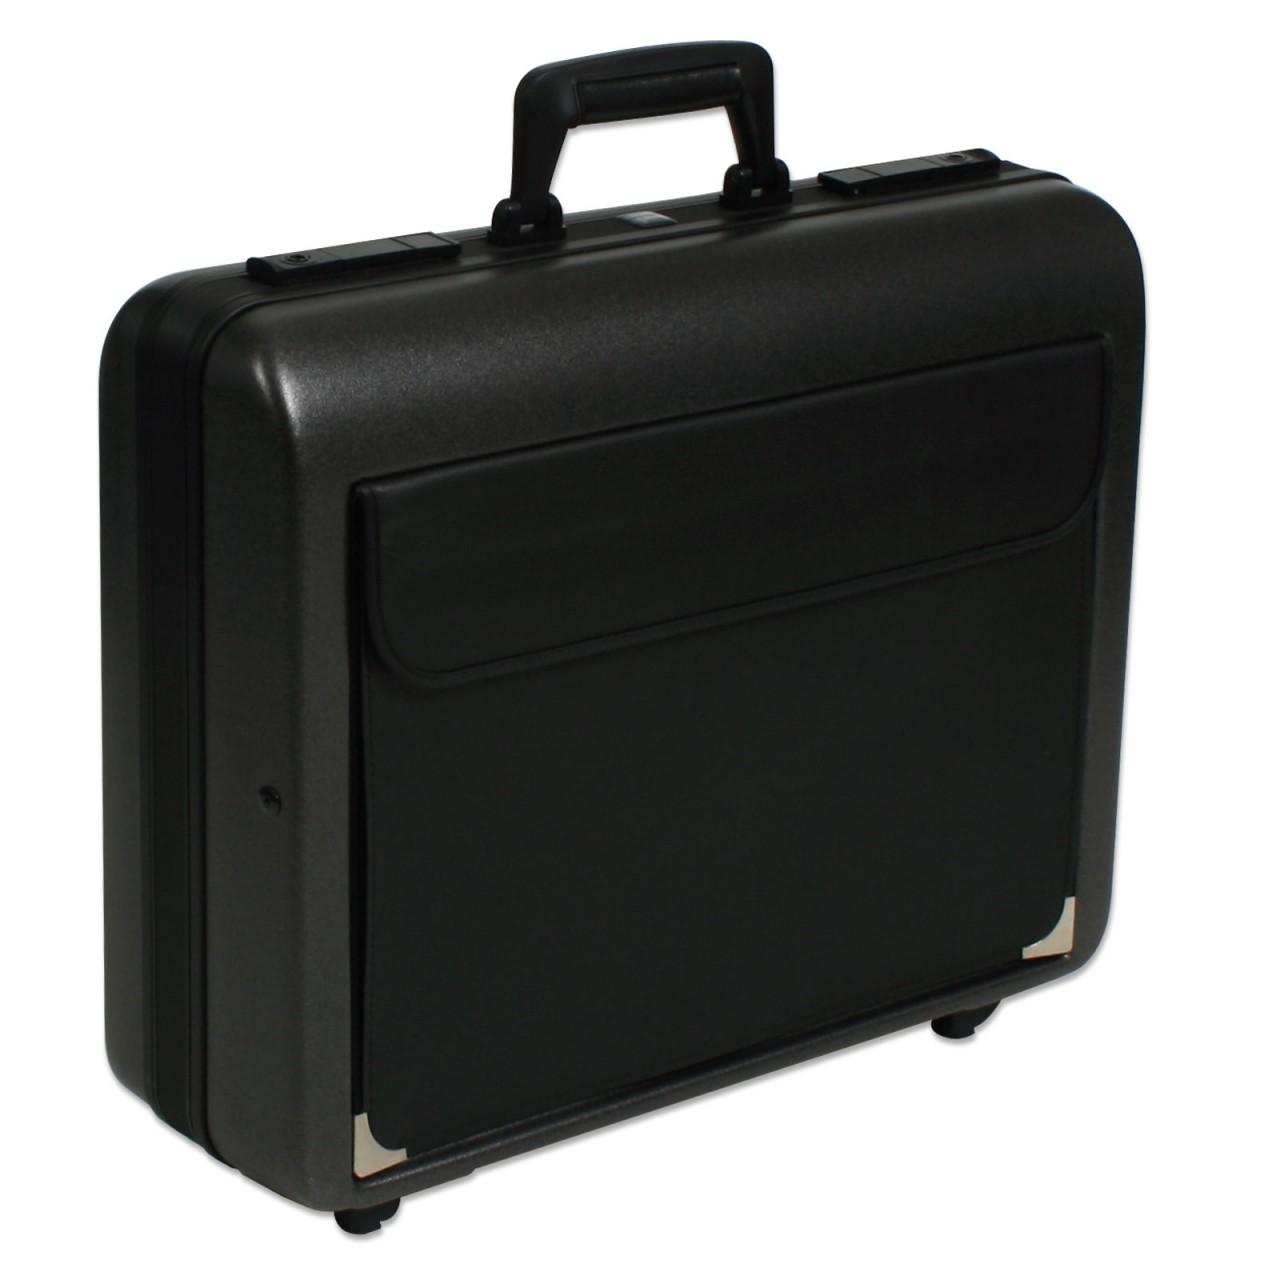 bwh koffer office case g nstig kaufen koffermarkt. Black Bedroom Furniture Sets. Home Design Ideas